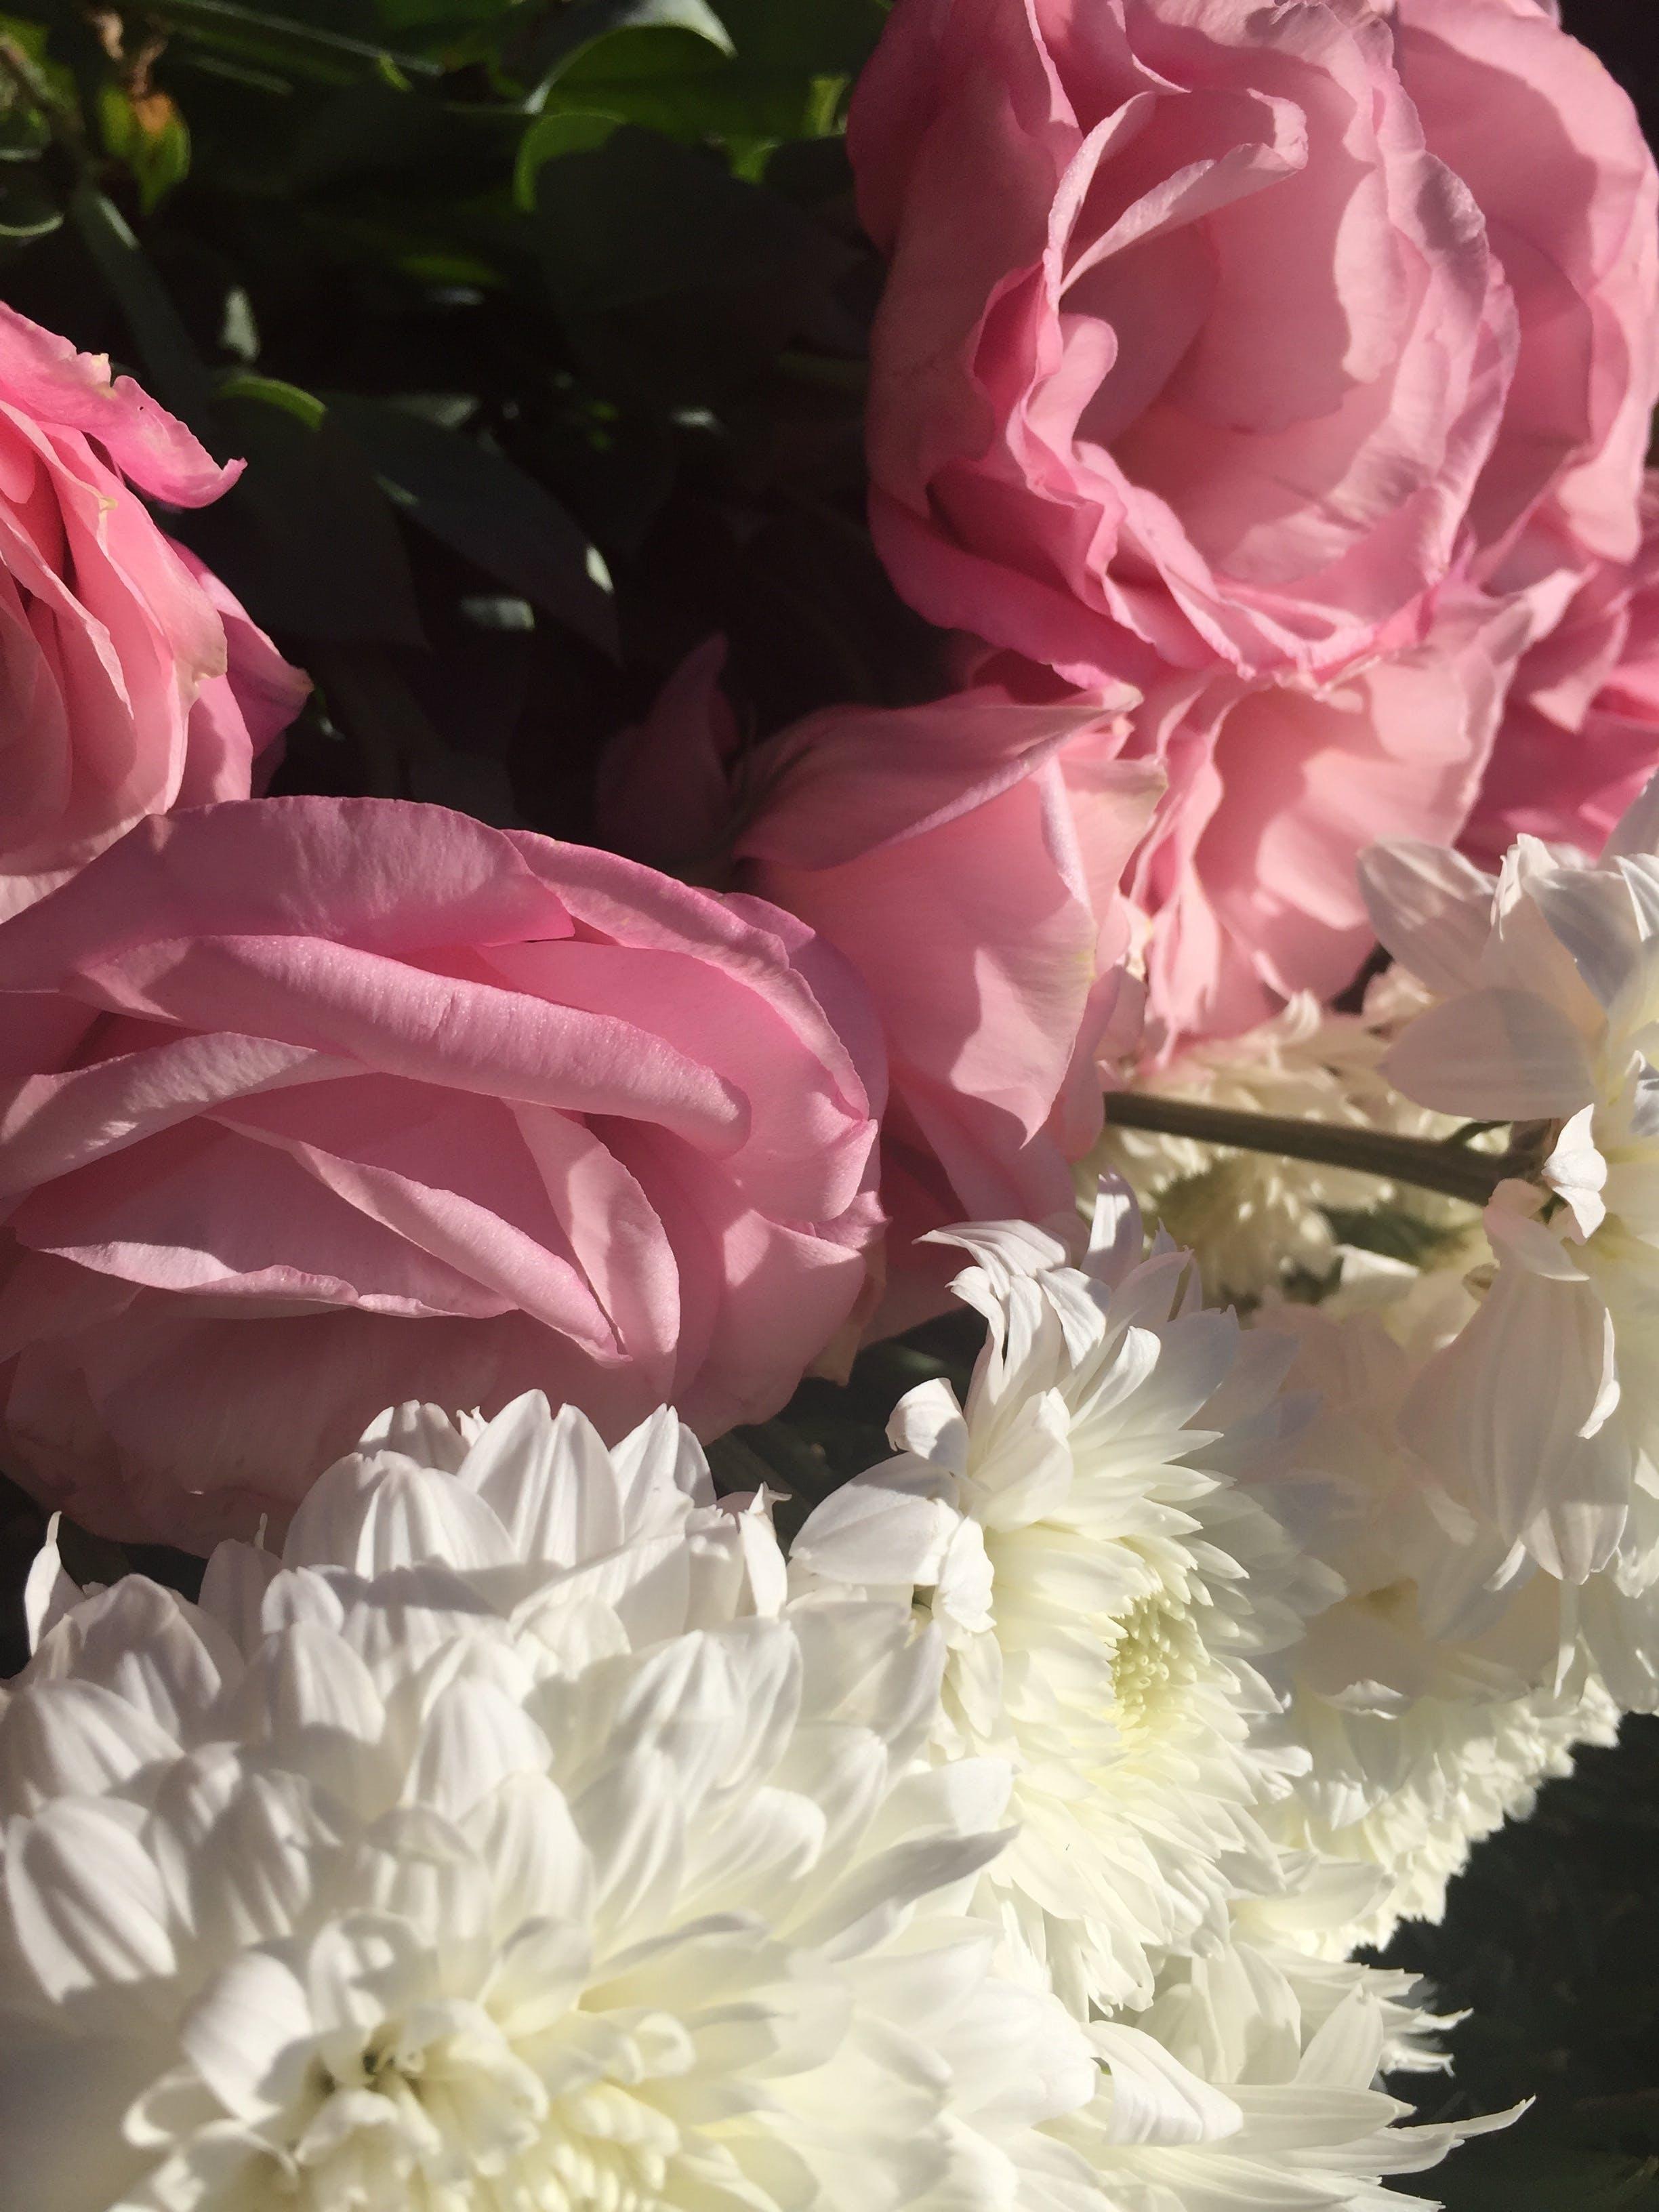 Free stock photo of flowers, white, pink, chrysanthemum